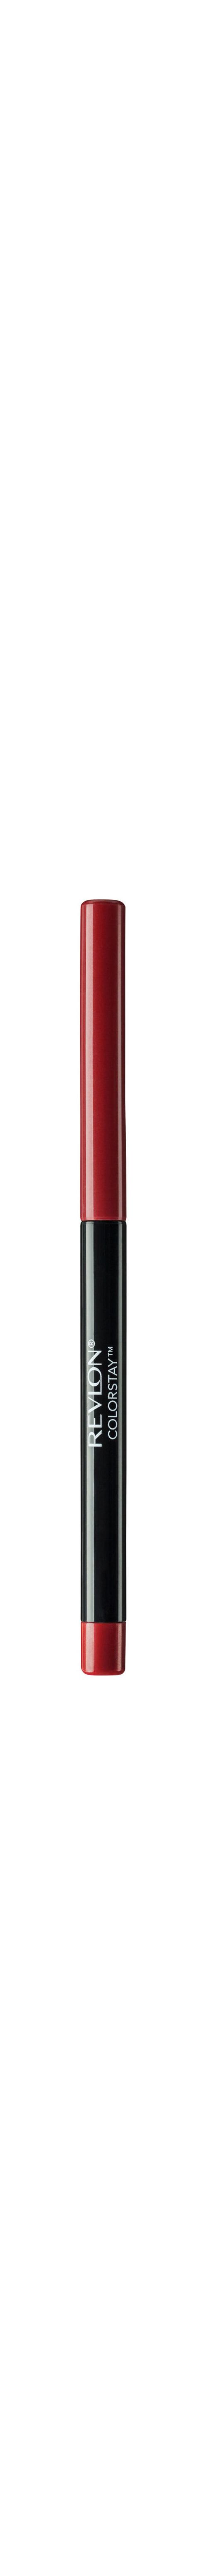 Revlon Colorstay™ Lipliner Red